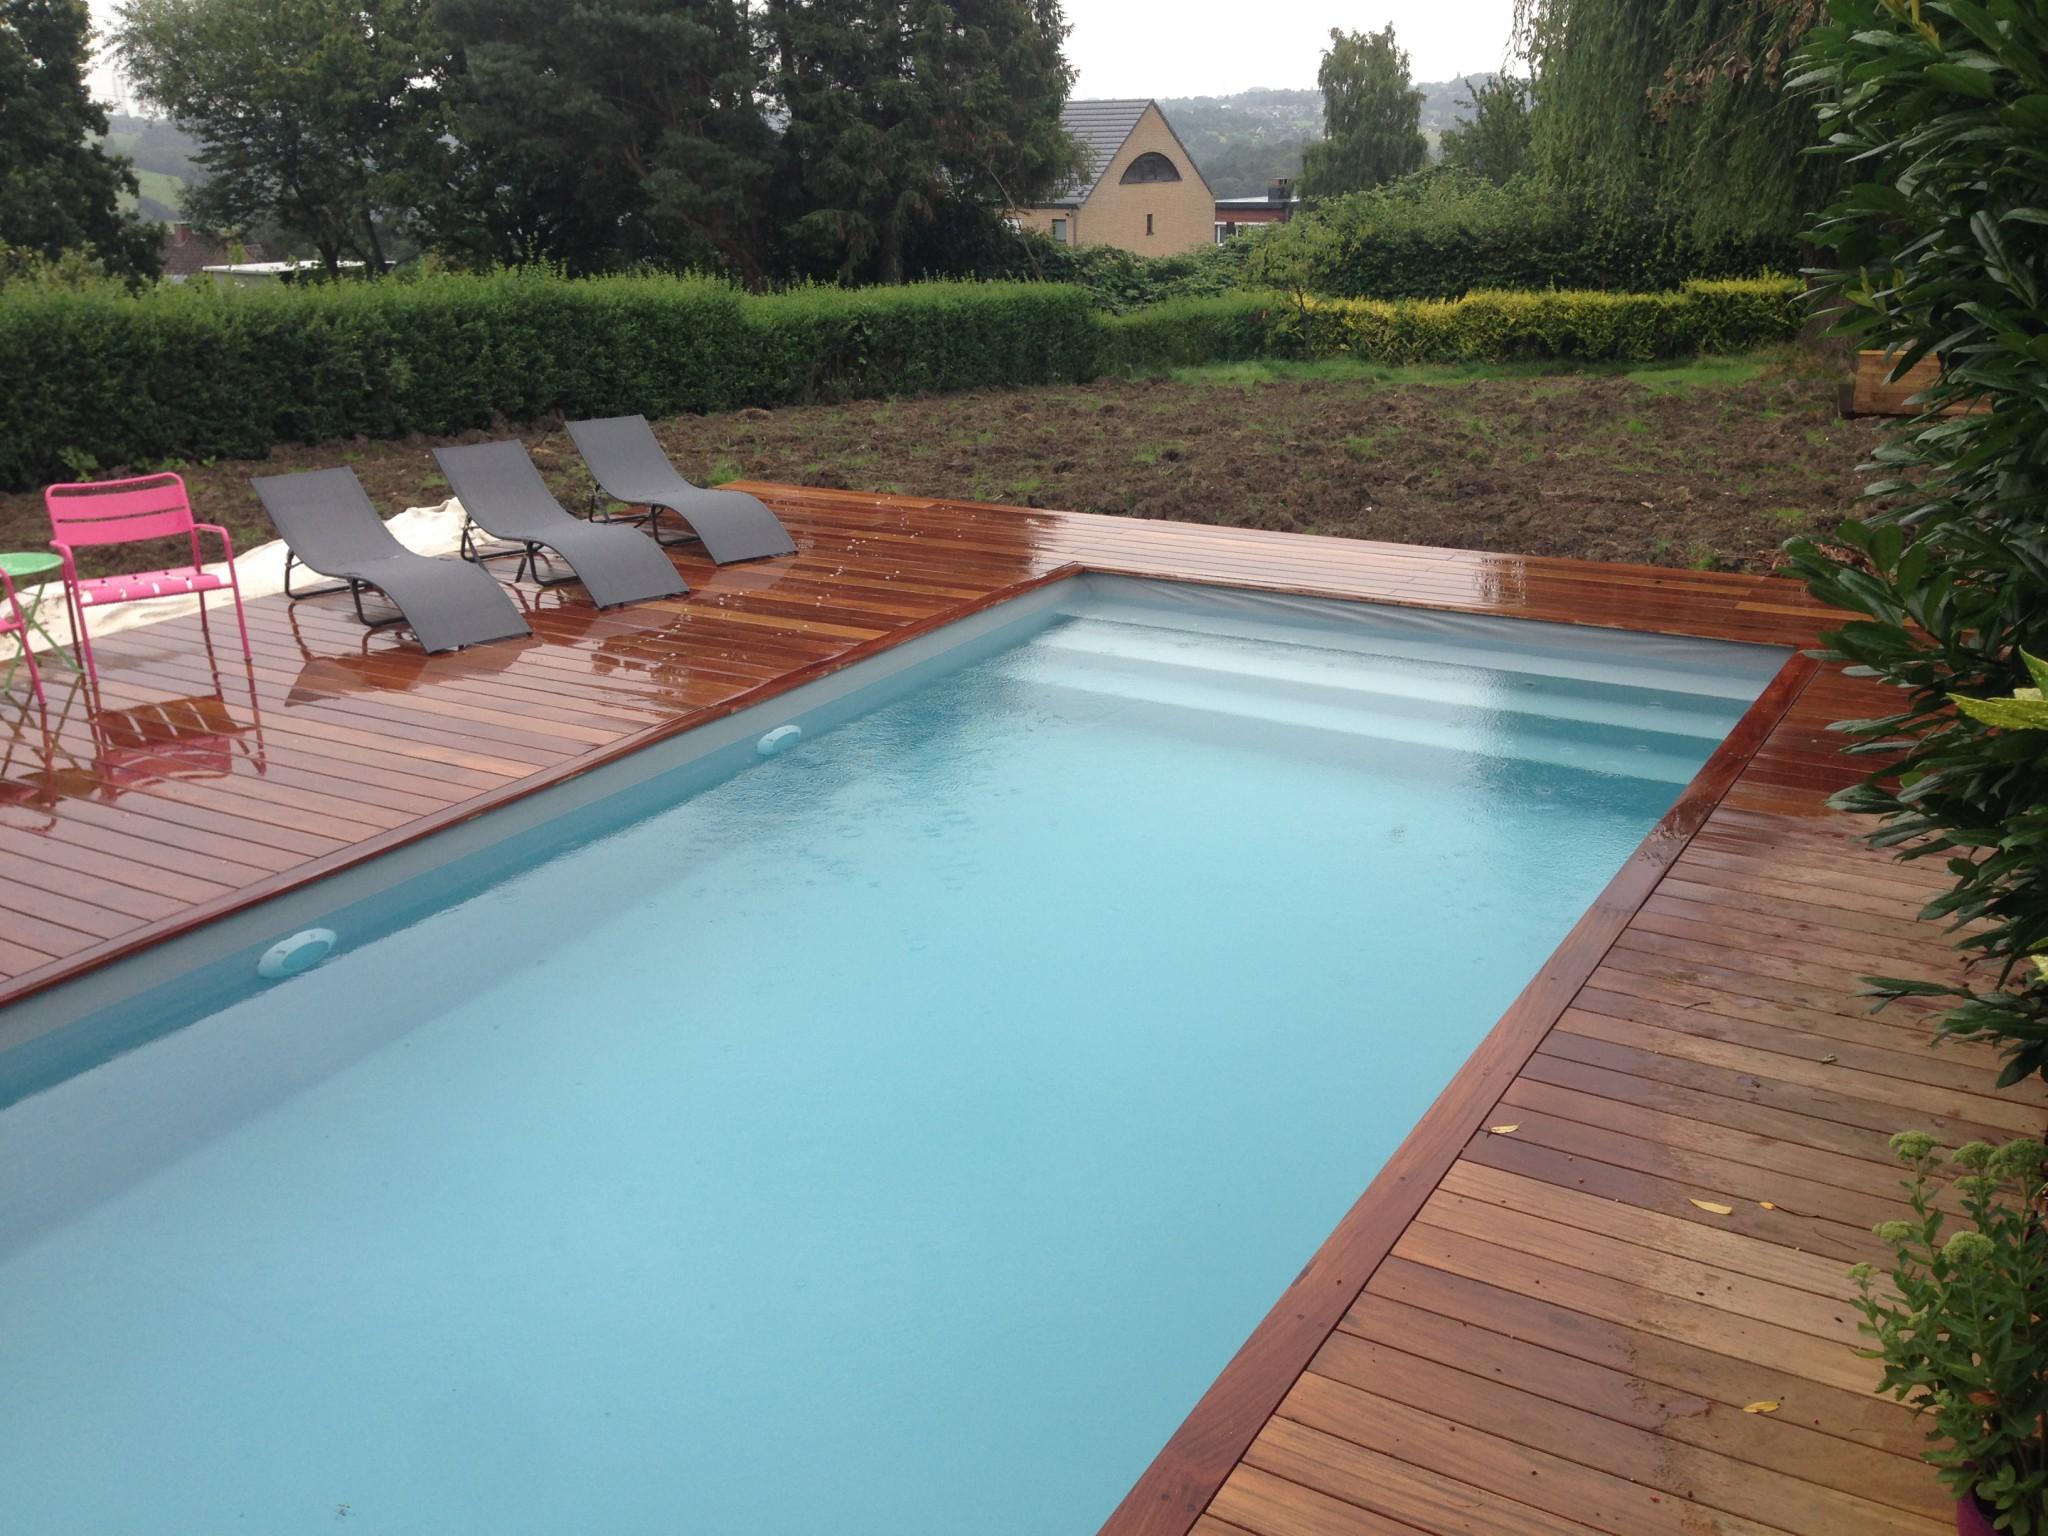 architecte tilkin li ge piscine 7 bureau d 39 architecture tilkin. Black Bedroom Furniture Sets. Home Design Ideas